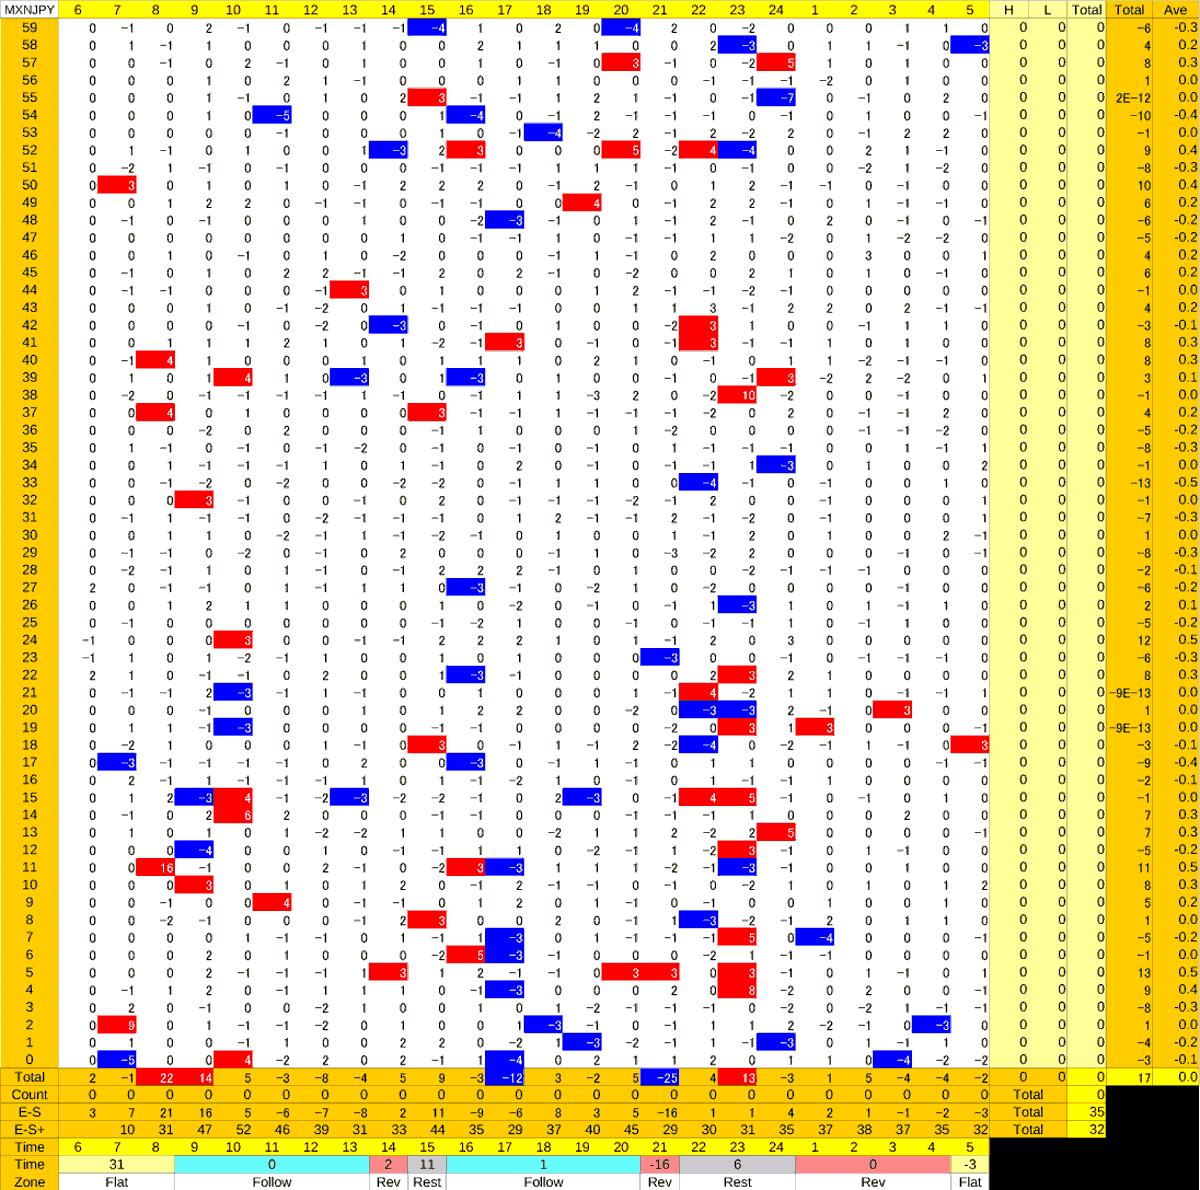 20200629_HS(3)MXNJPY